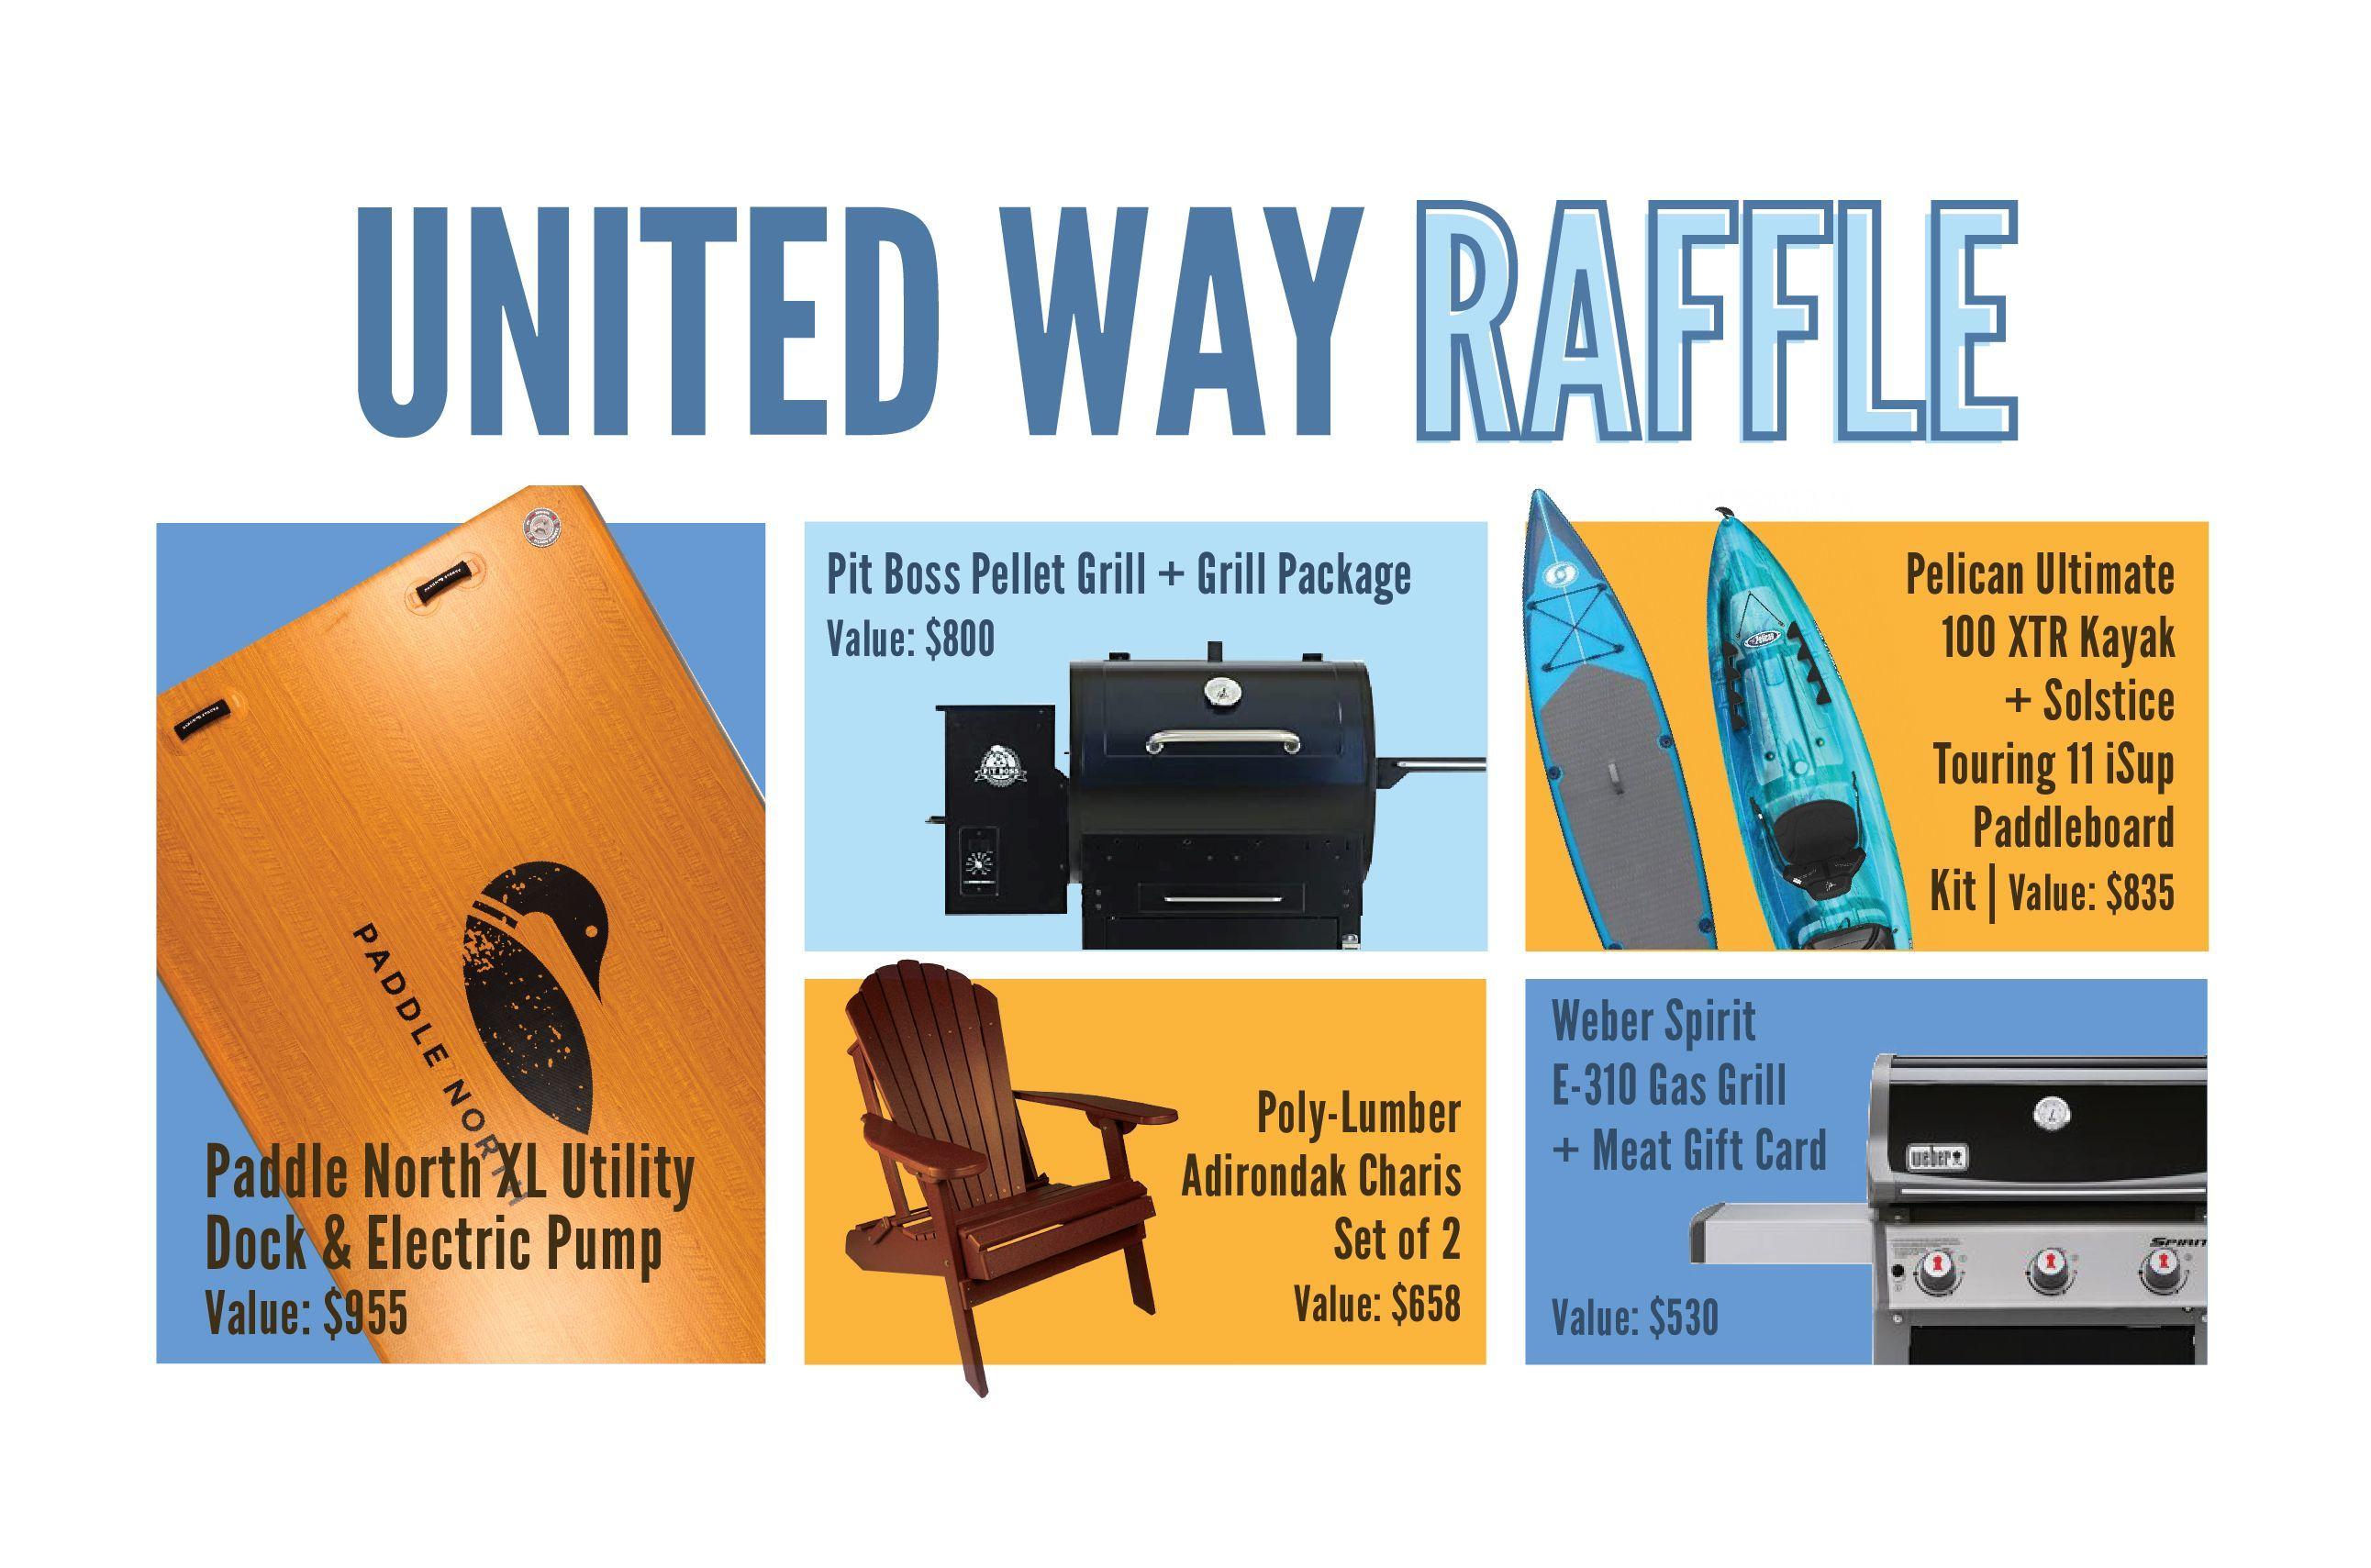 United Way Raffle